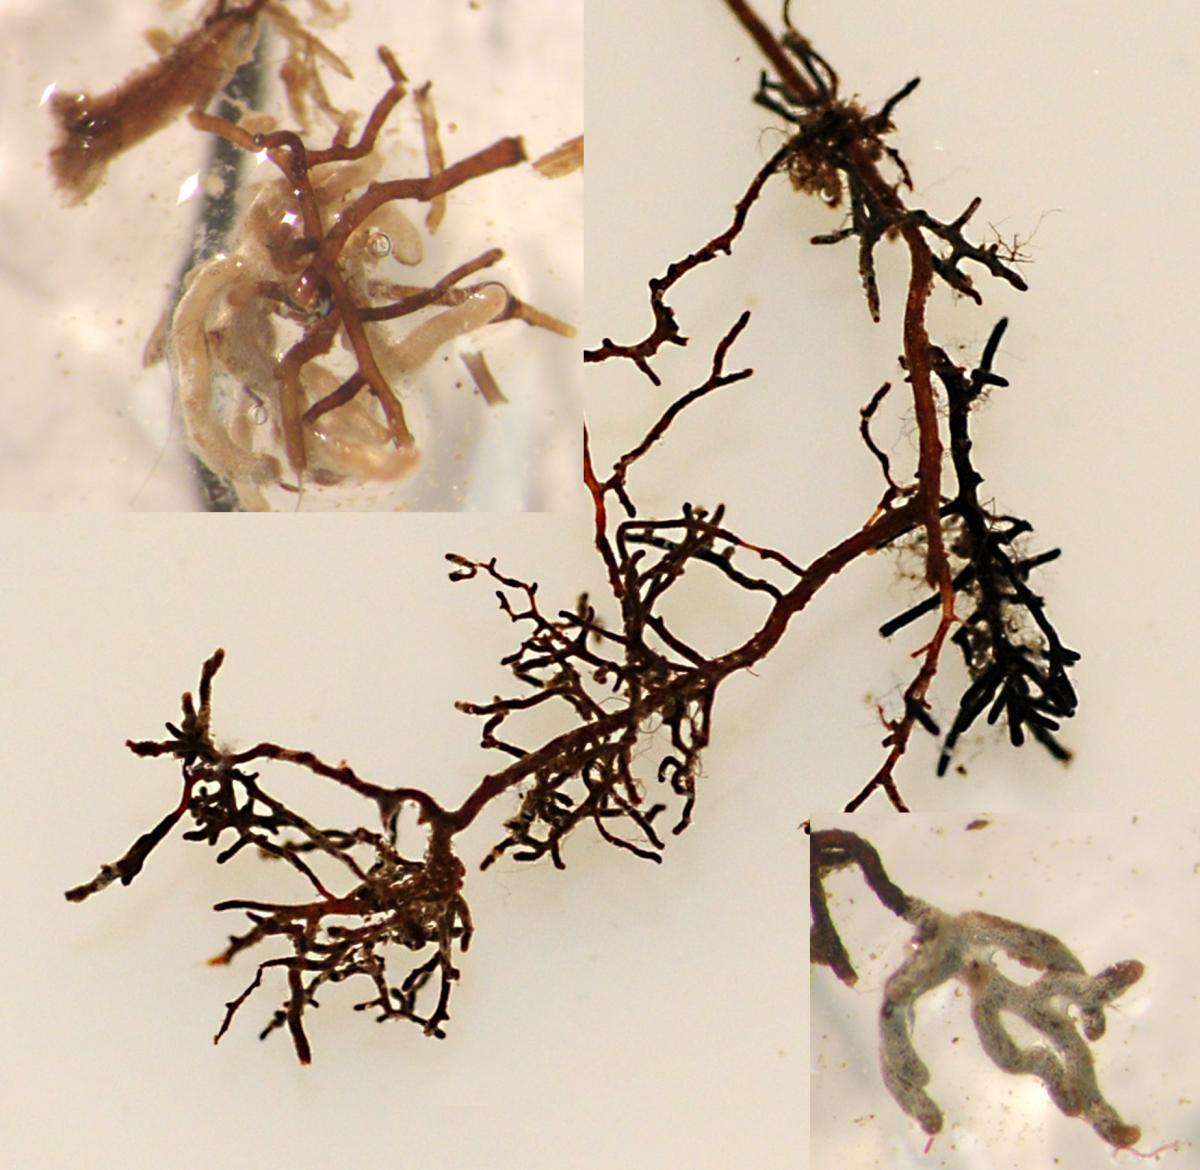 Ectomycorrhizal roots